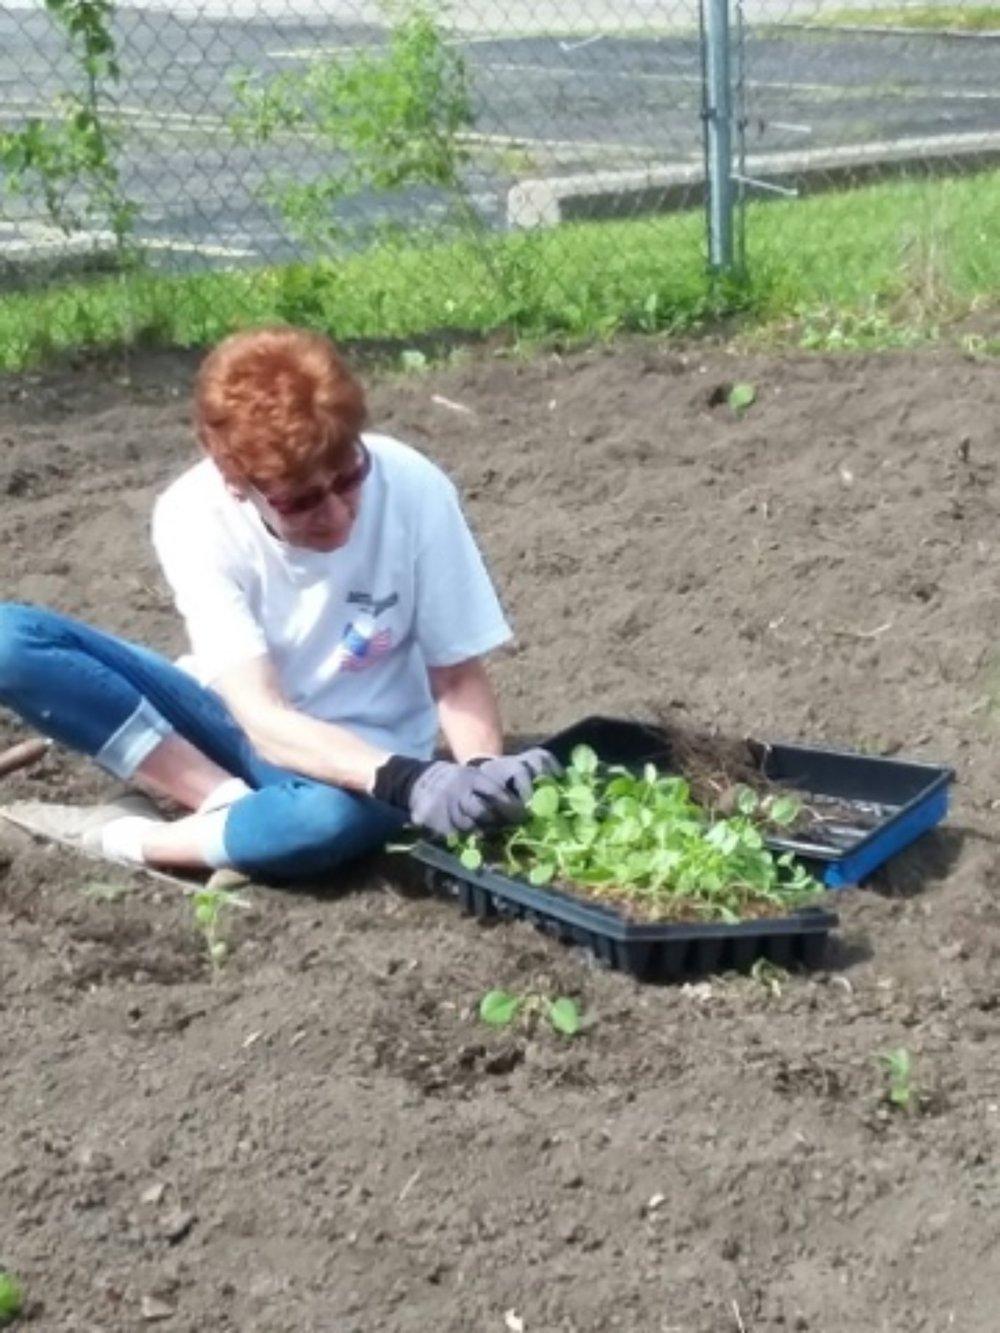 sppc_gardening_06.jpg